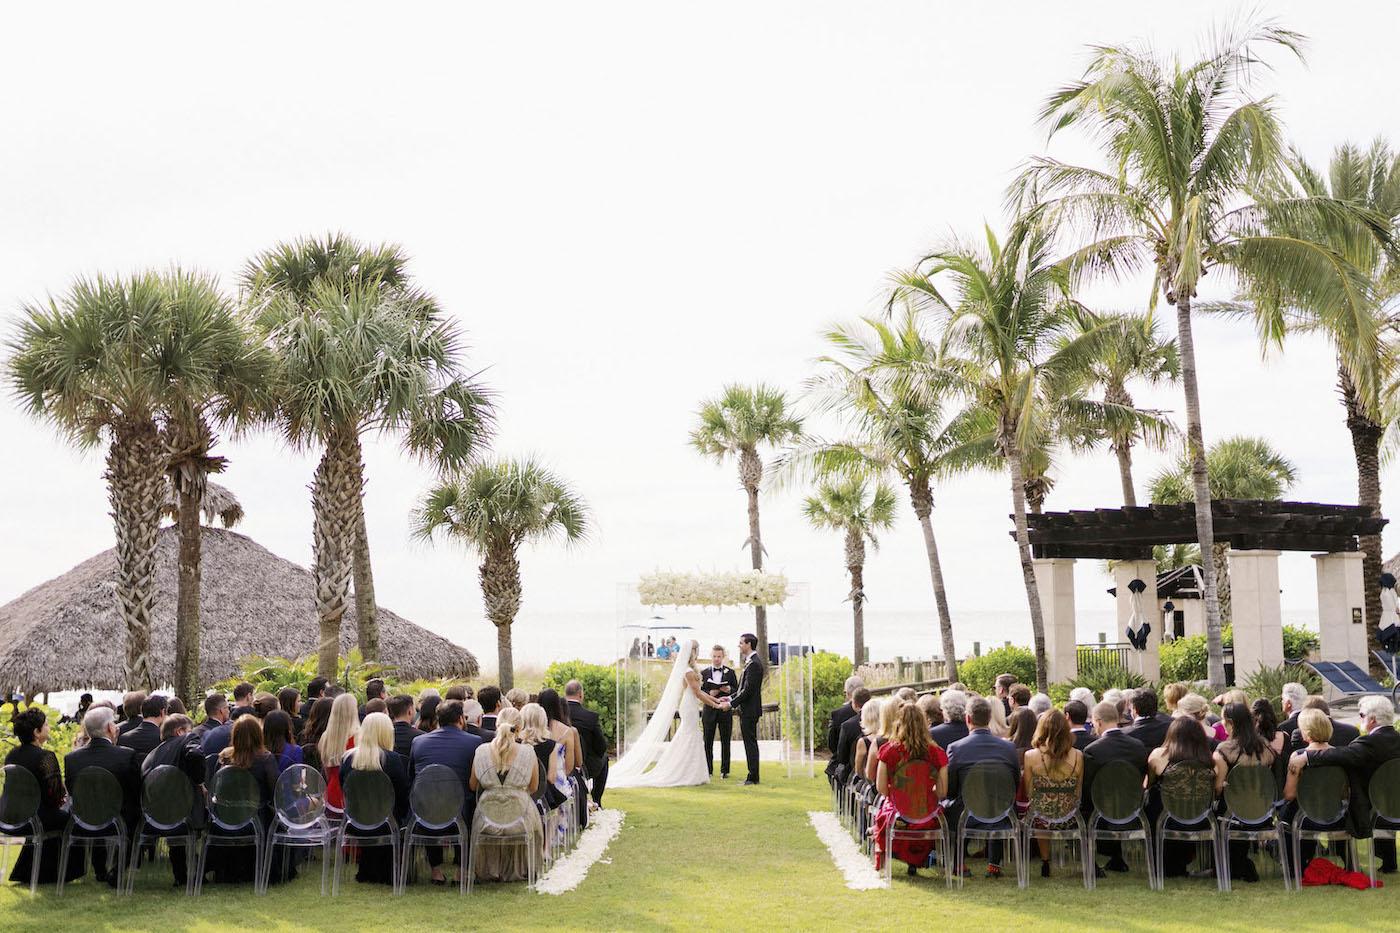 wedding-ceremony-ritz-carlton-sarasota-beach-club-lawn.jpg